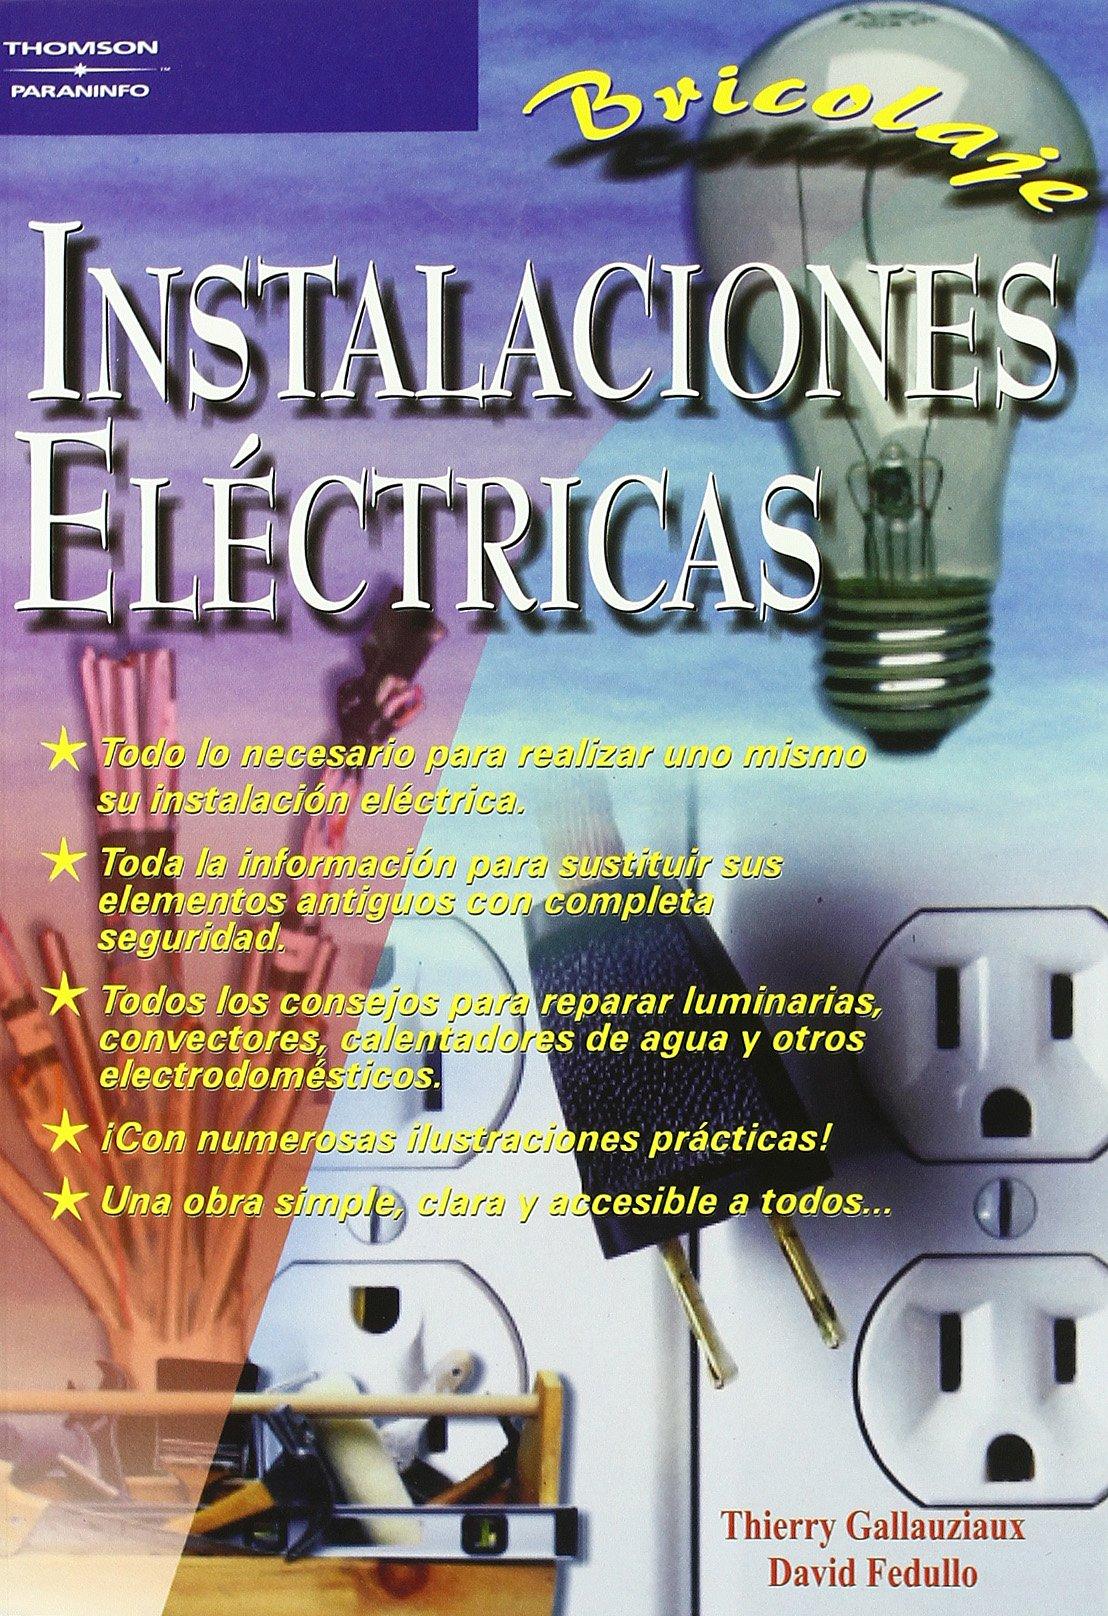 Instalaciones Electricas - Bricolaje (Spanish Edition) (Spanish) Paperback – November, 2001